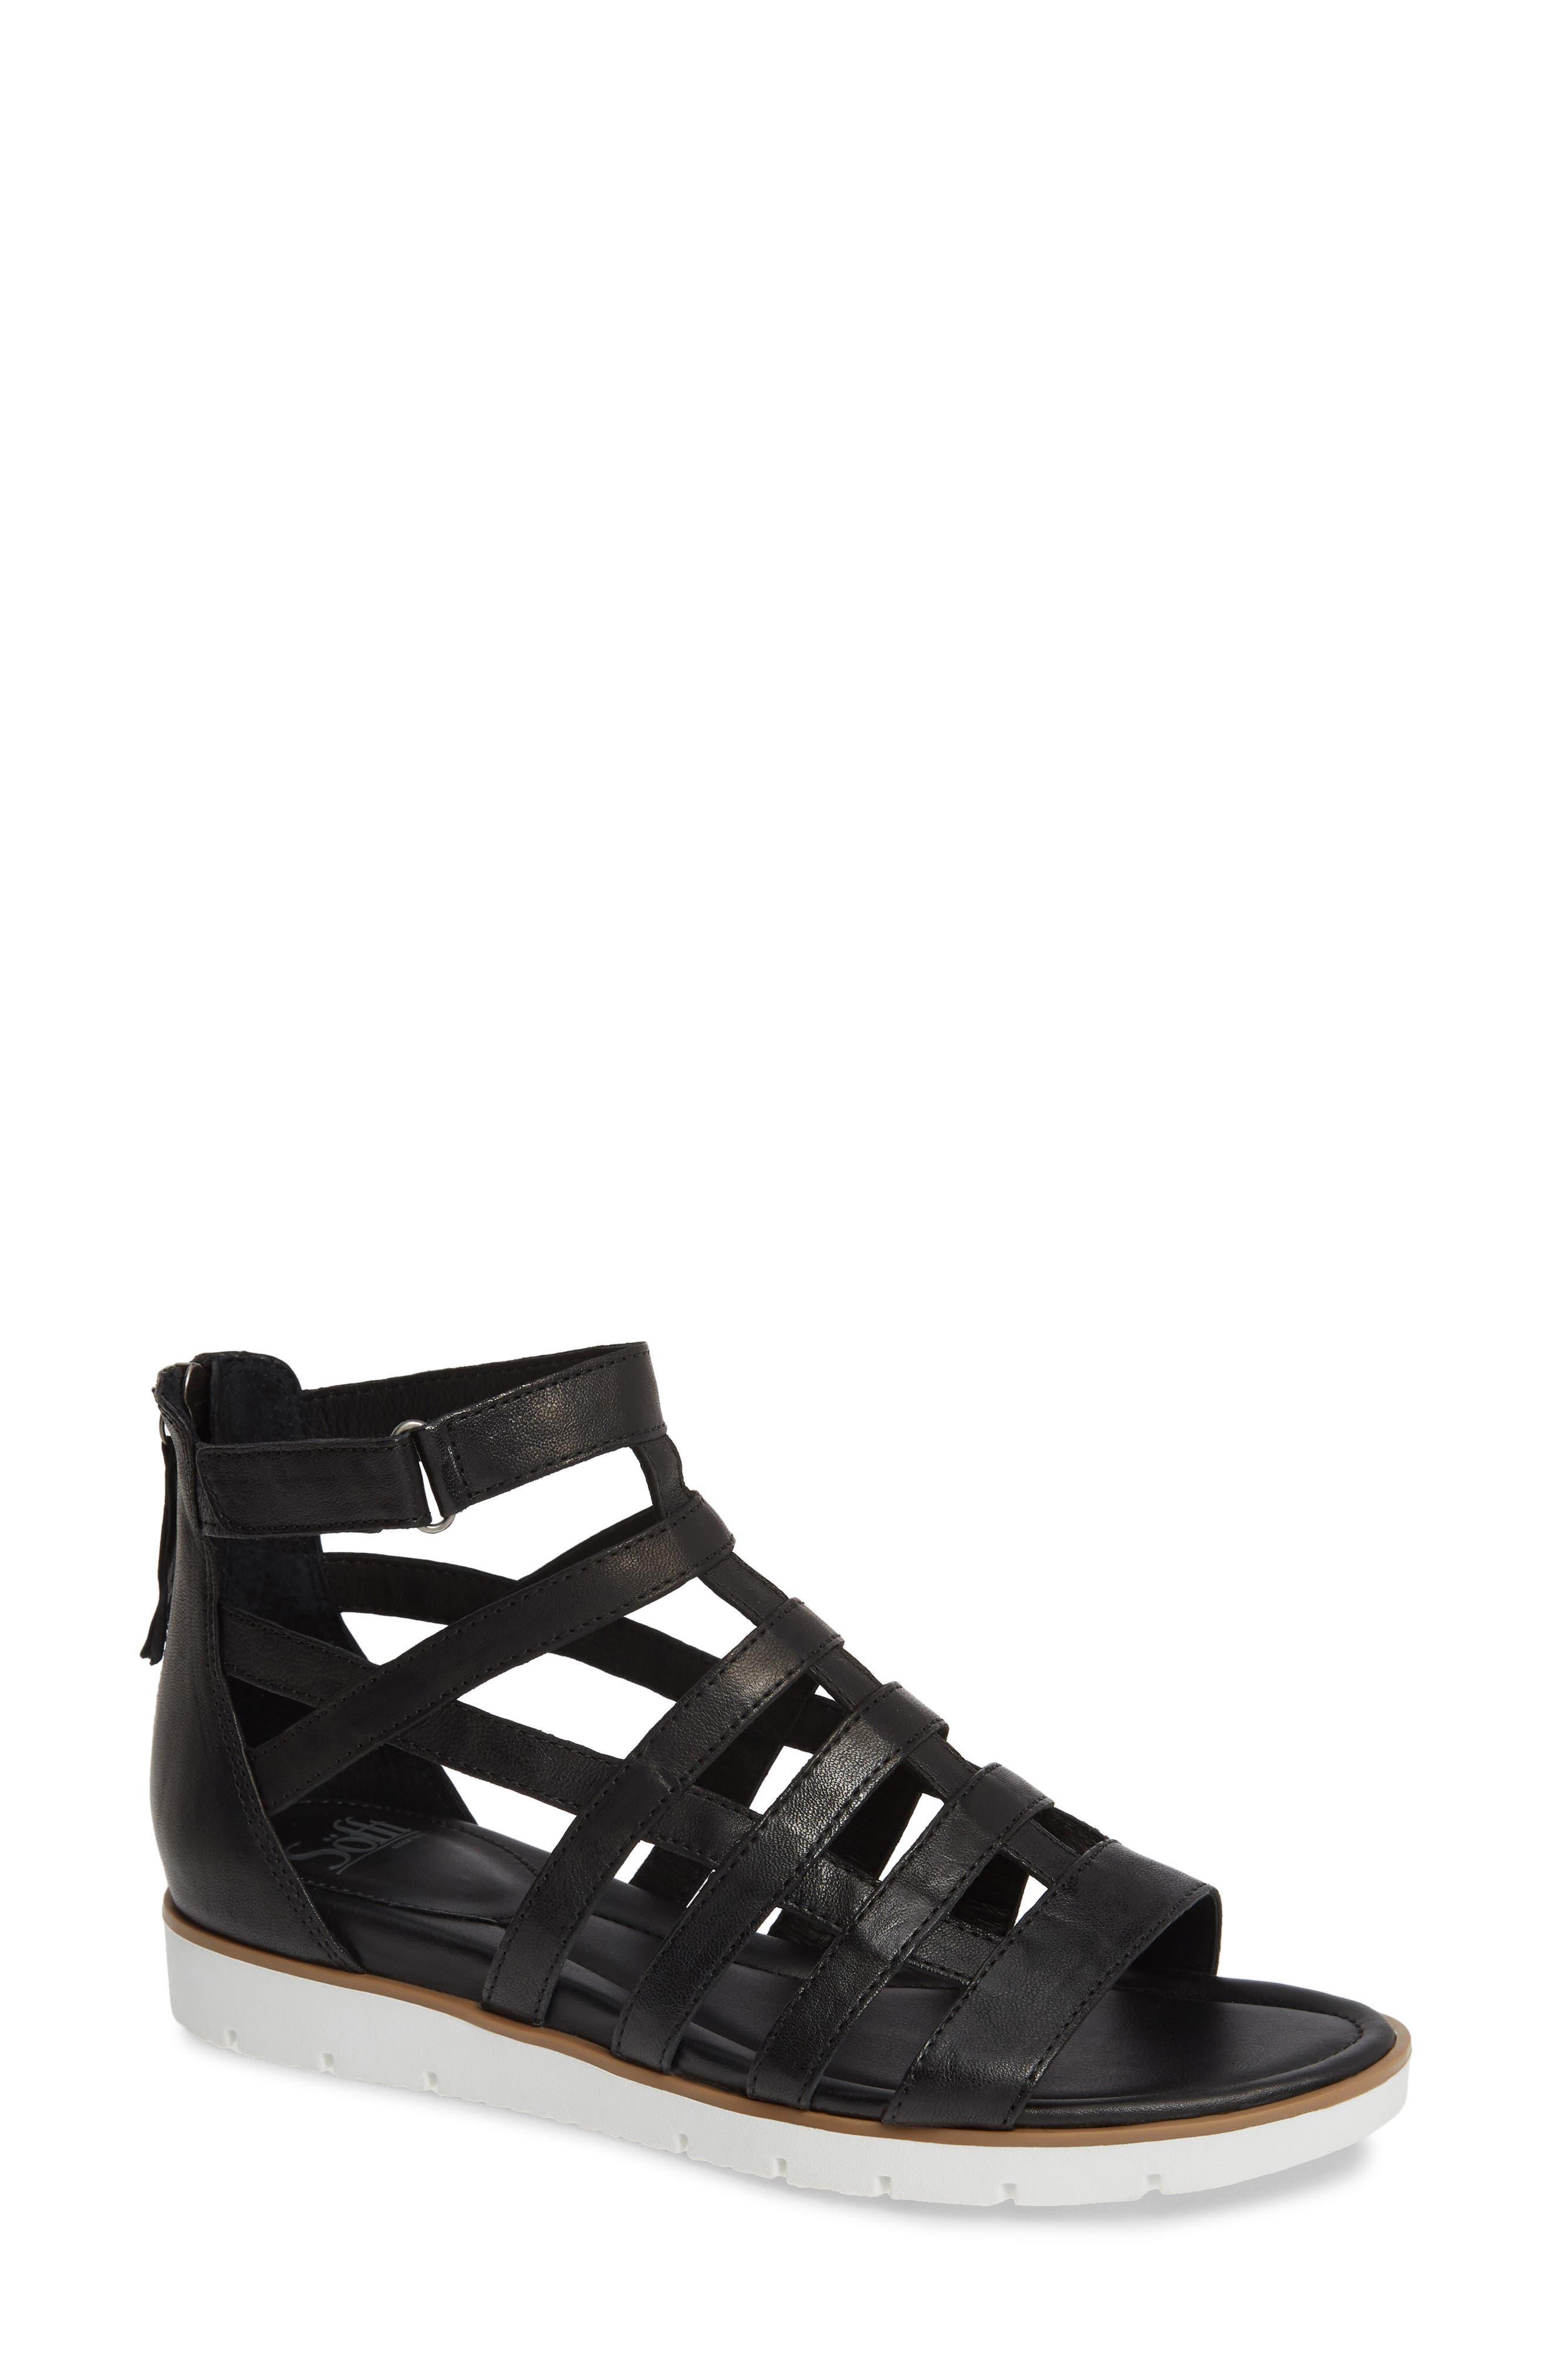 Mahari Gladiator Sandal, Main, color, BLACK LEATHER